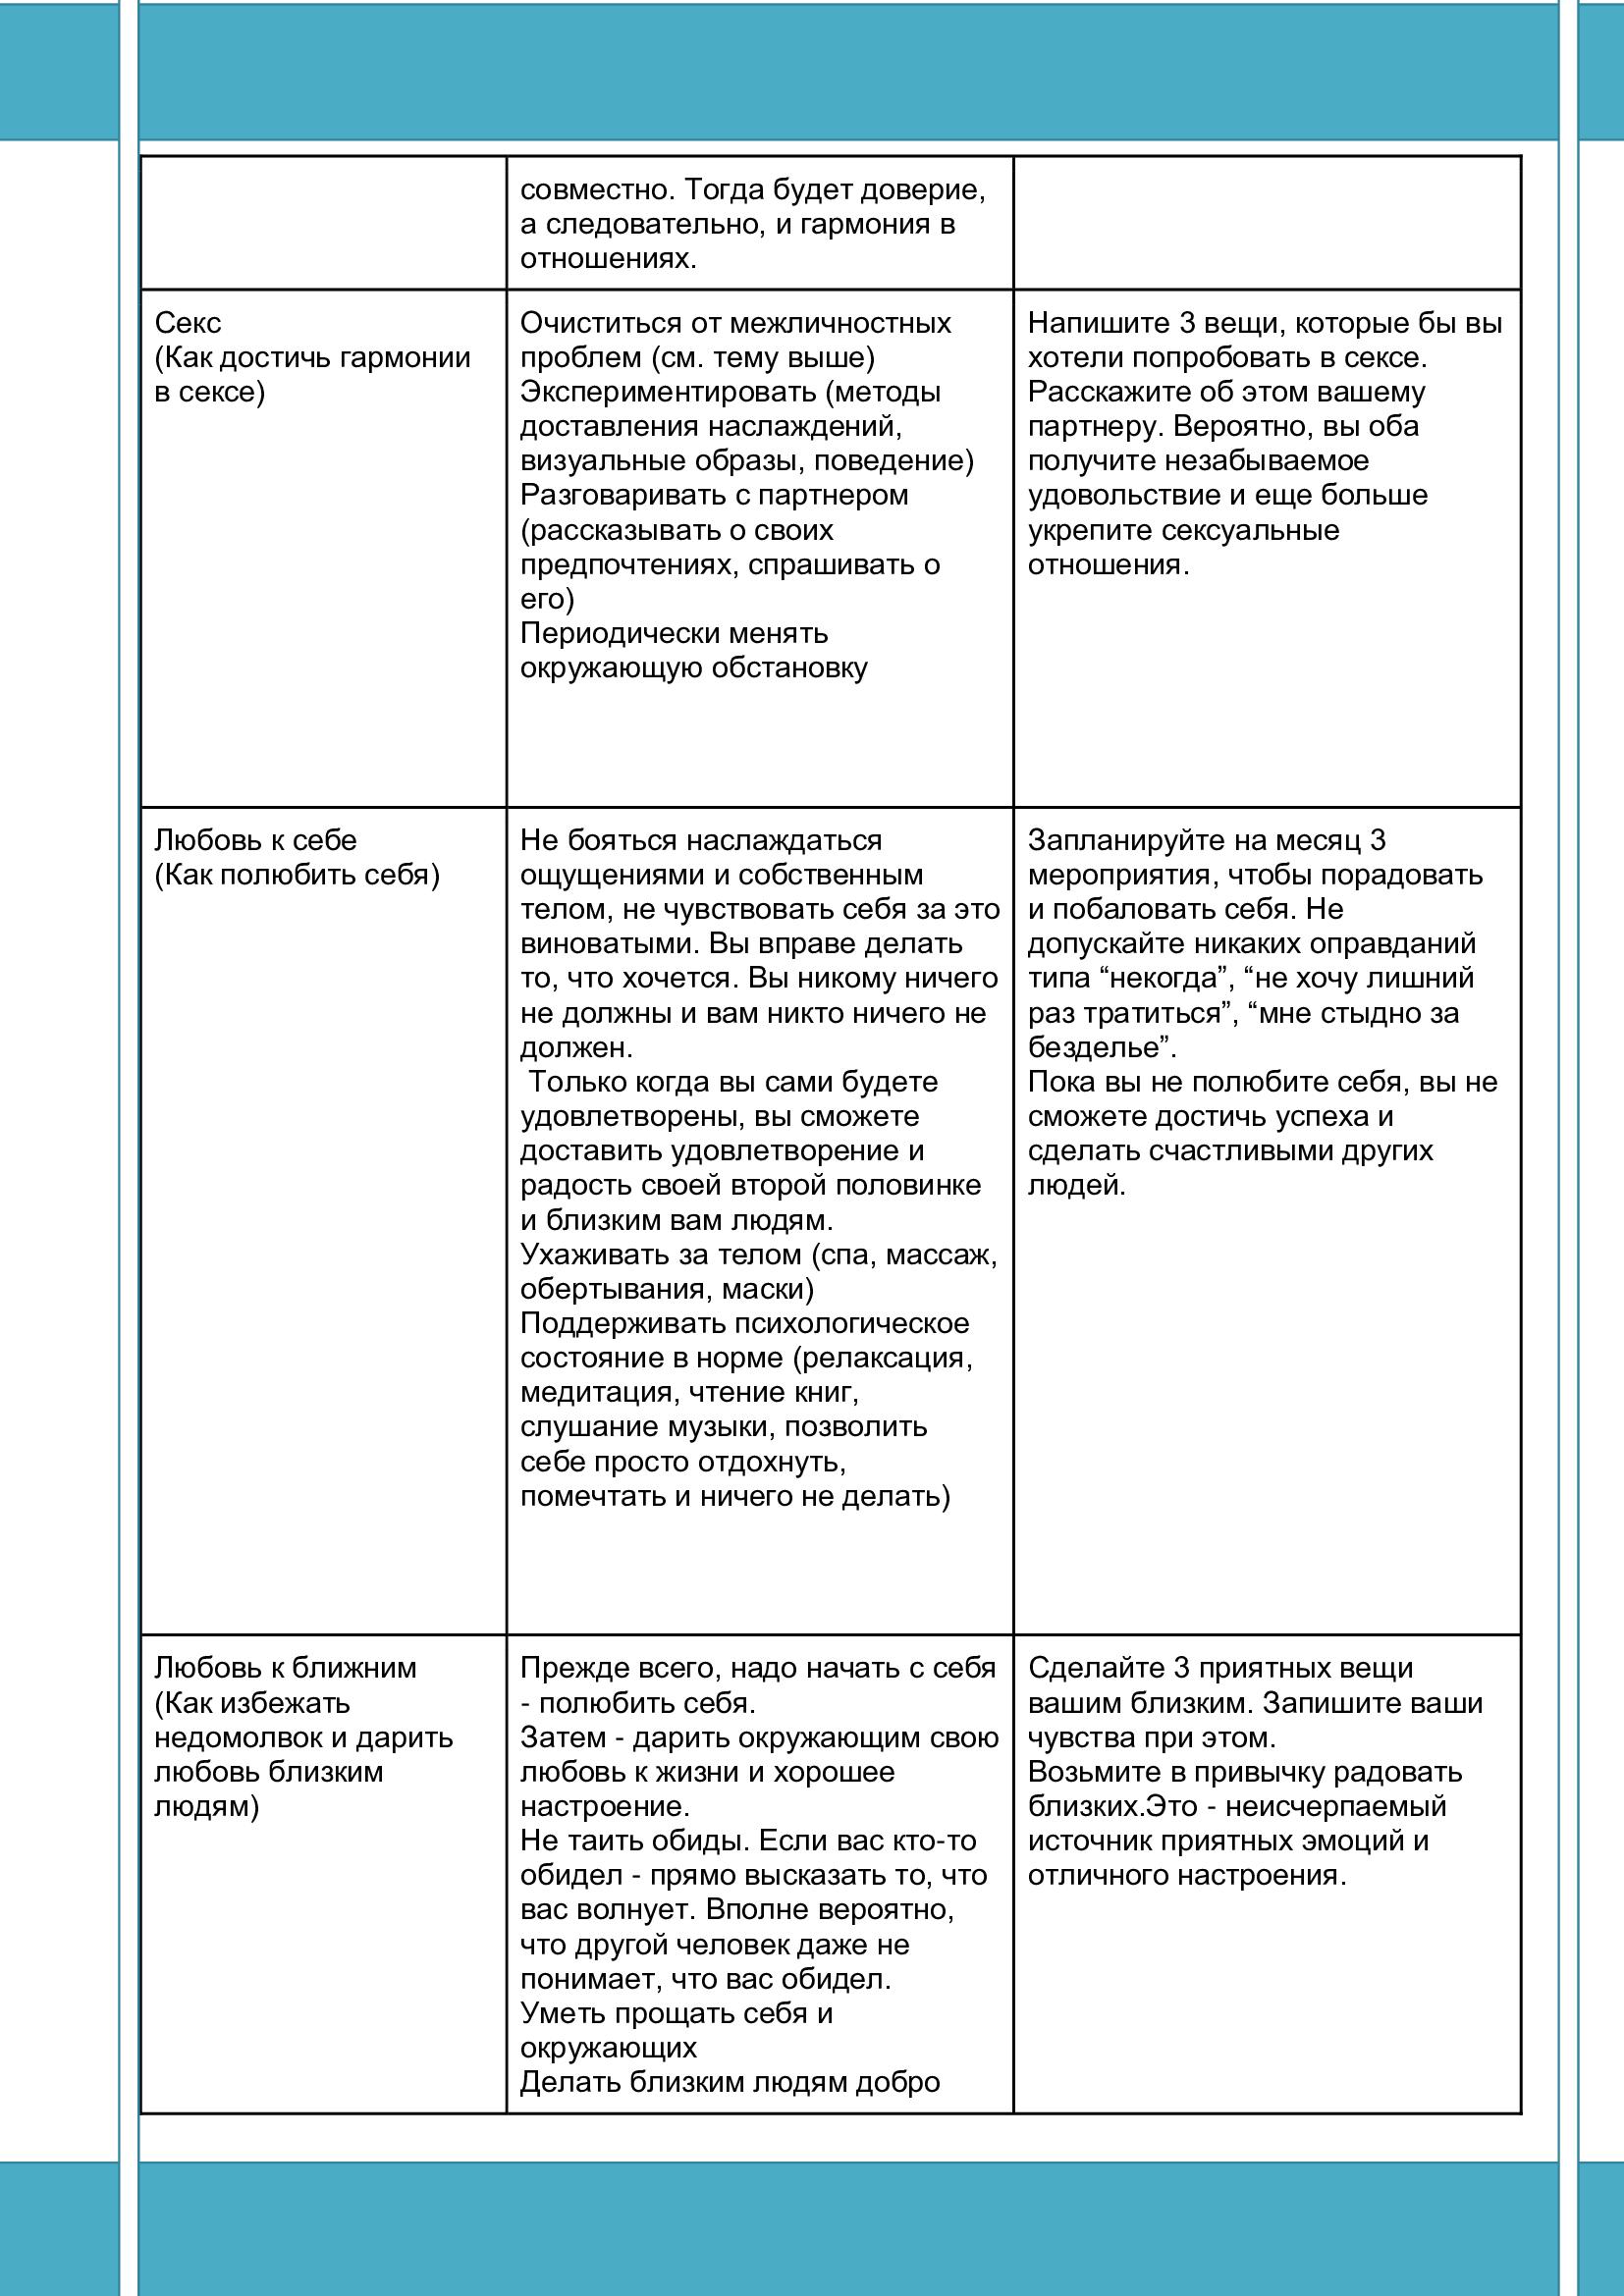 Марафон (гармония/успех) - контент-план (начало контент плана)